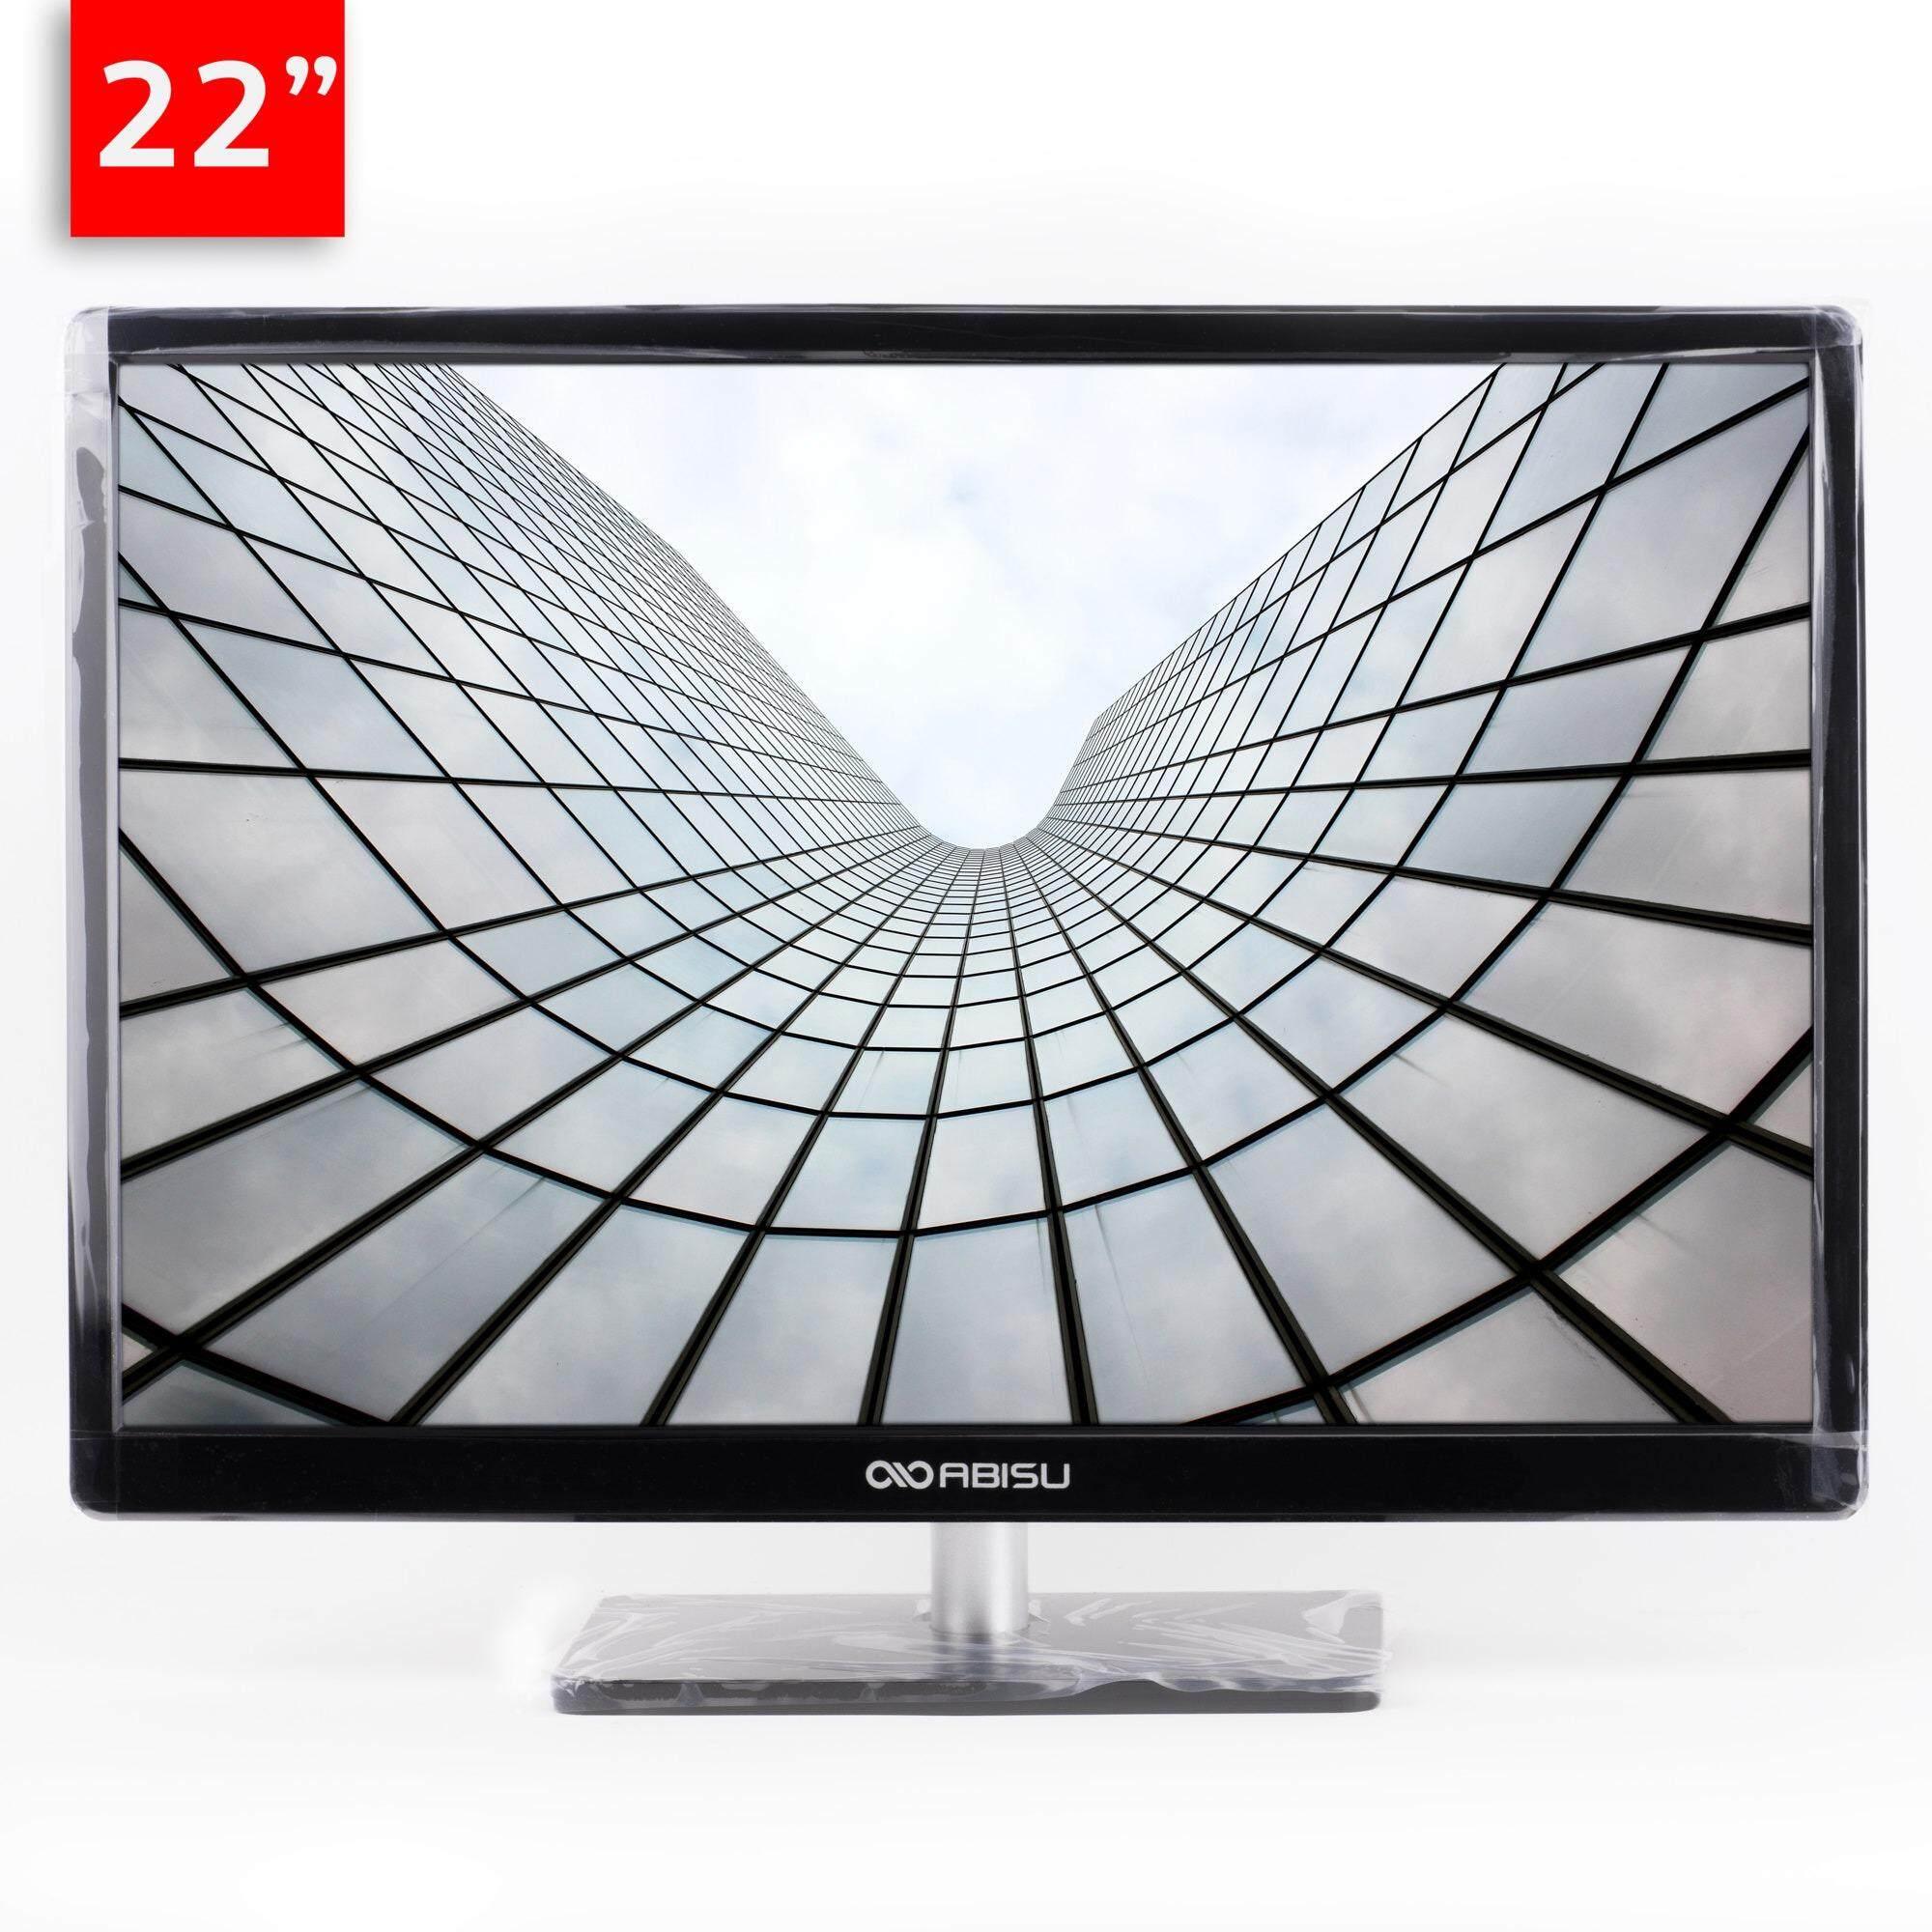 ABISU LED Monitor 22\ (Wide Screen) with HDMI Port